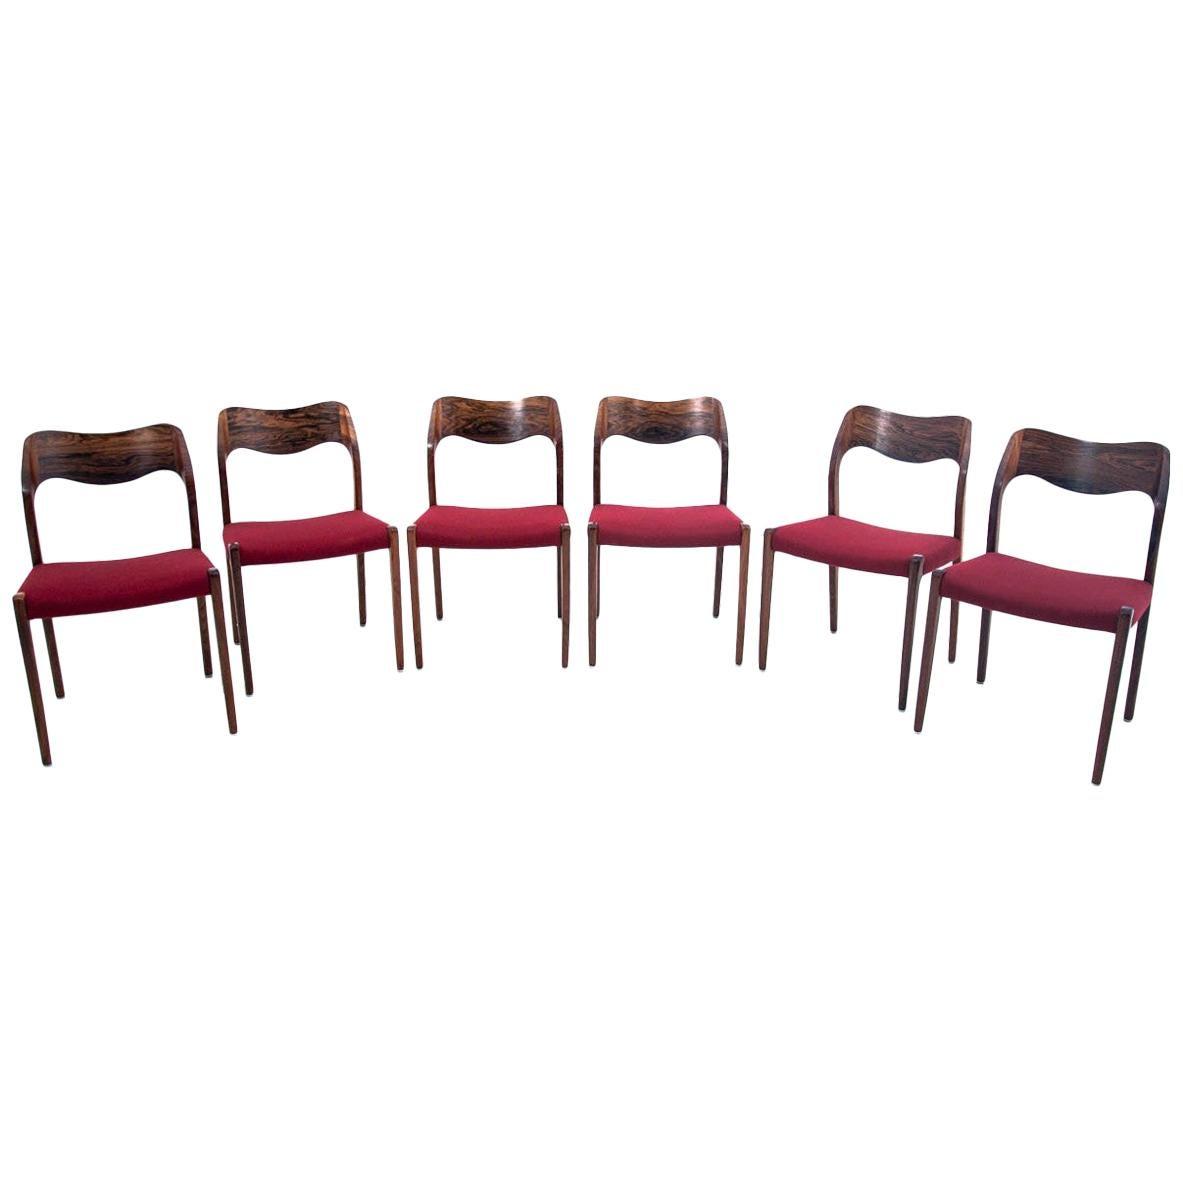 Six Chairs, Niels O. Møller, Model 71, Danish Design, 1960s